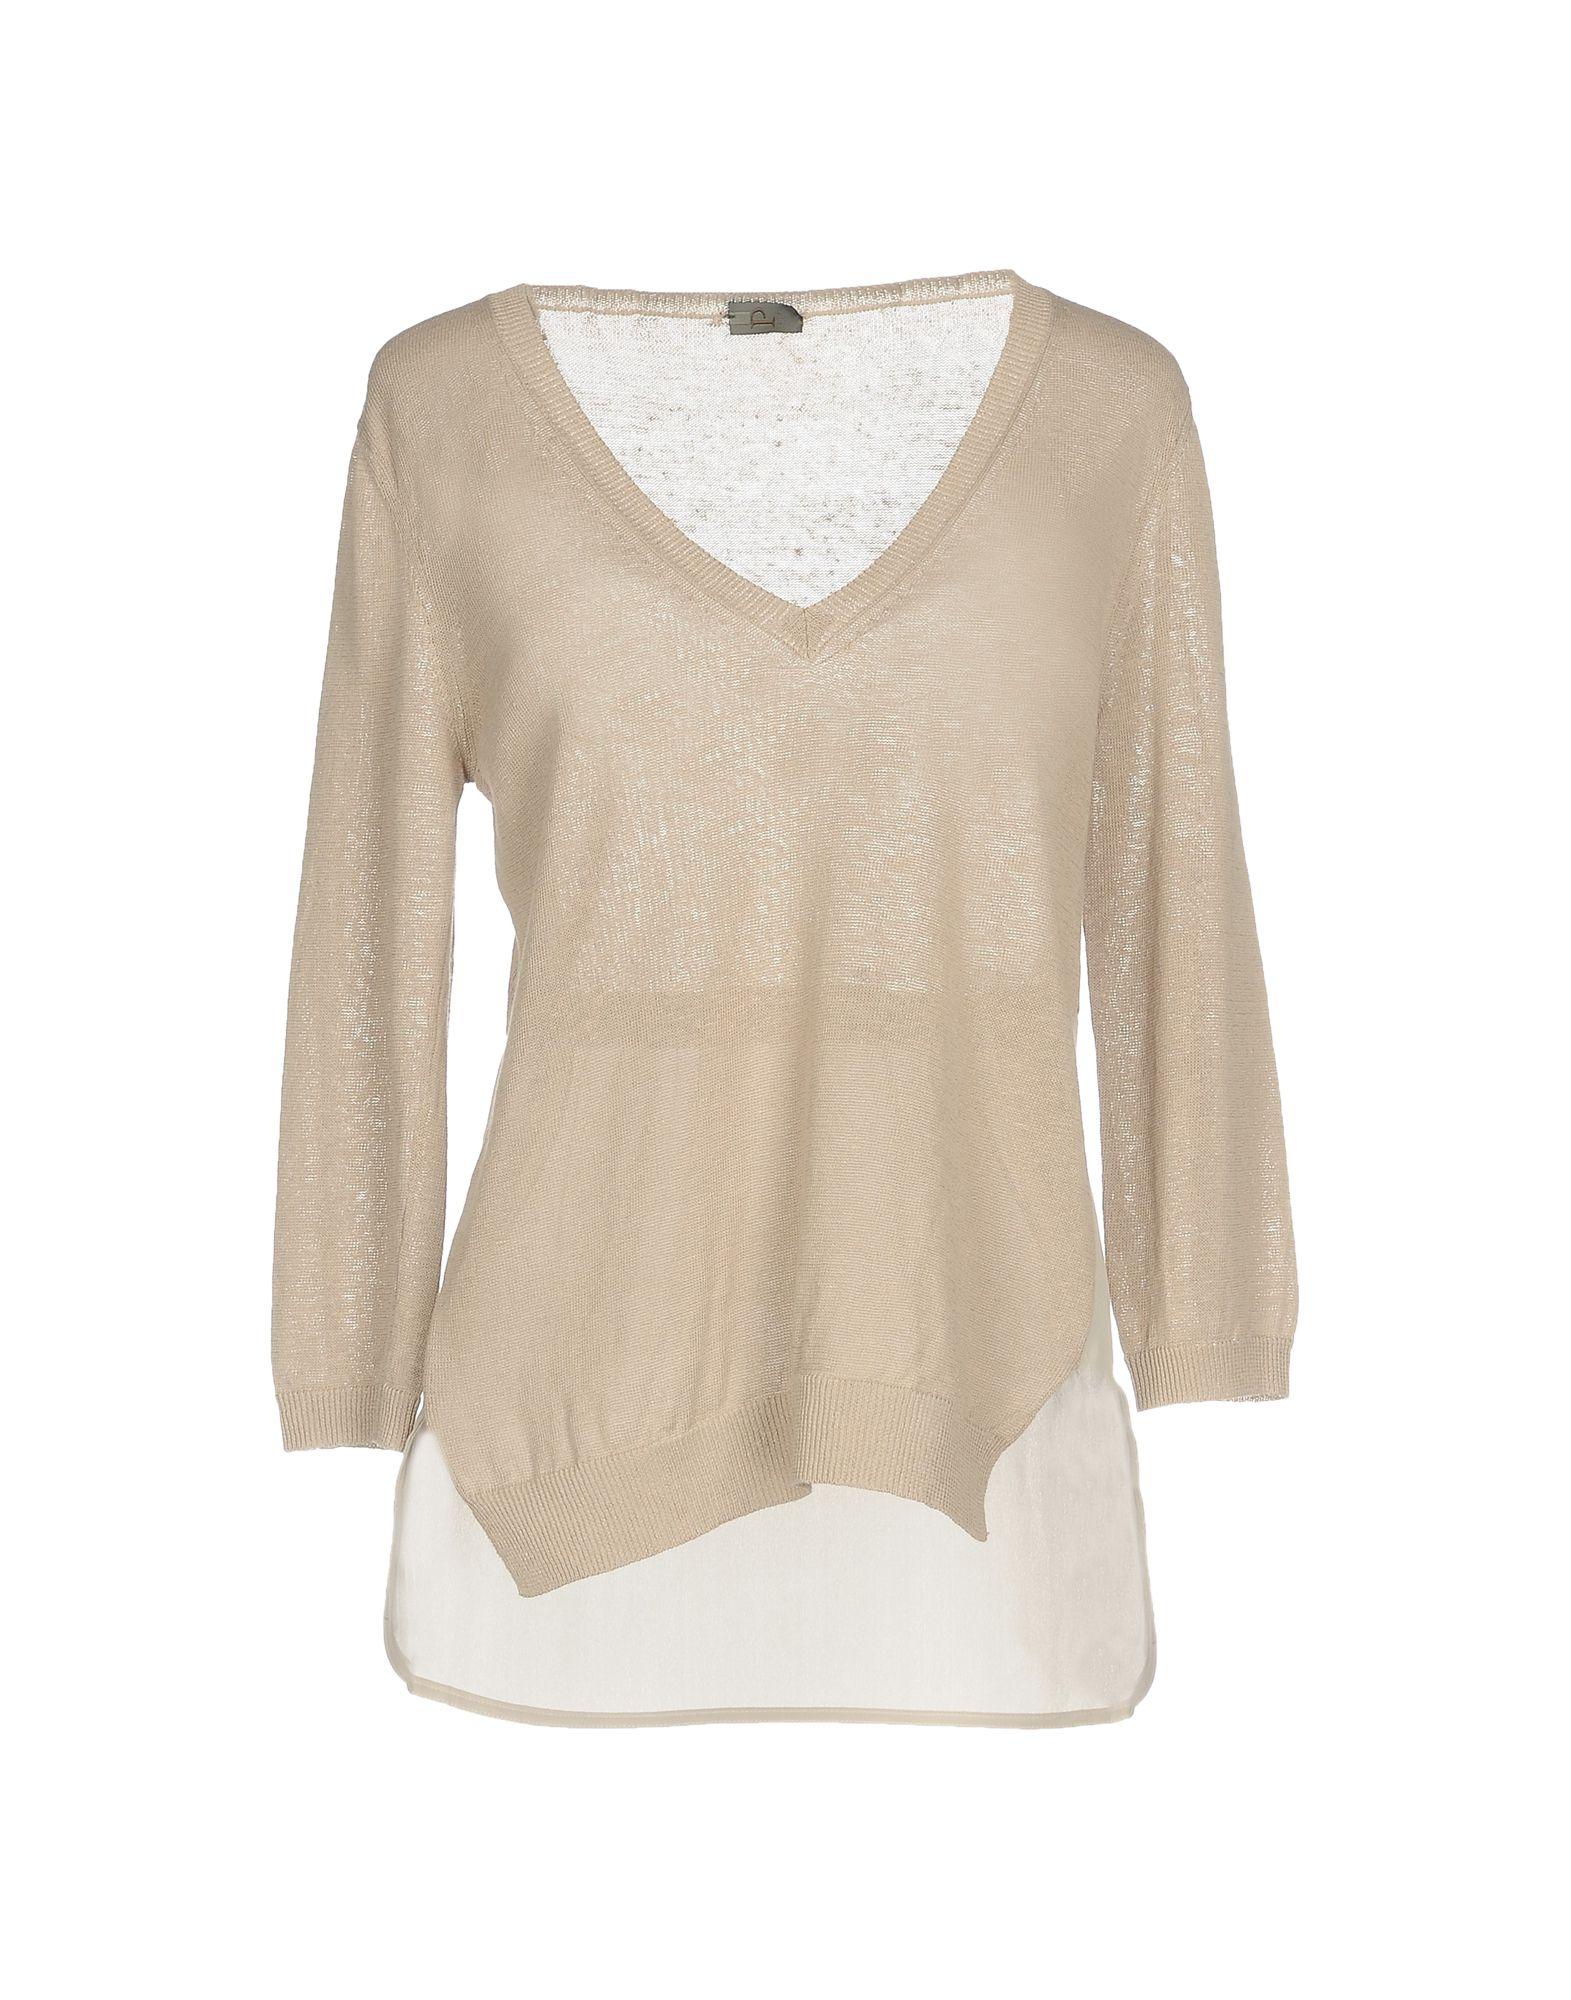 Pullover P One Donna - Acquista online su RPLle4Kppo